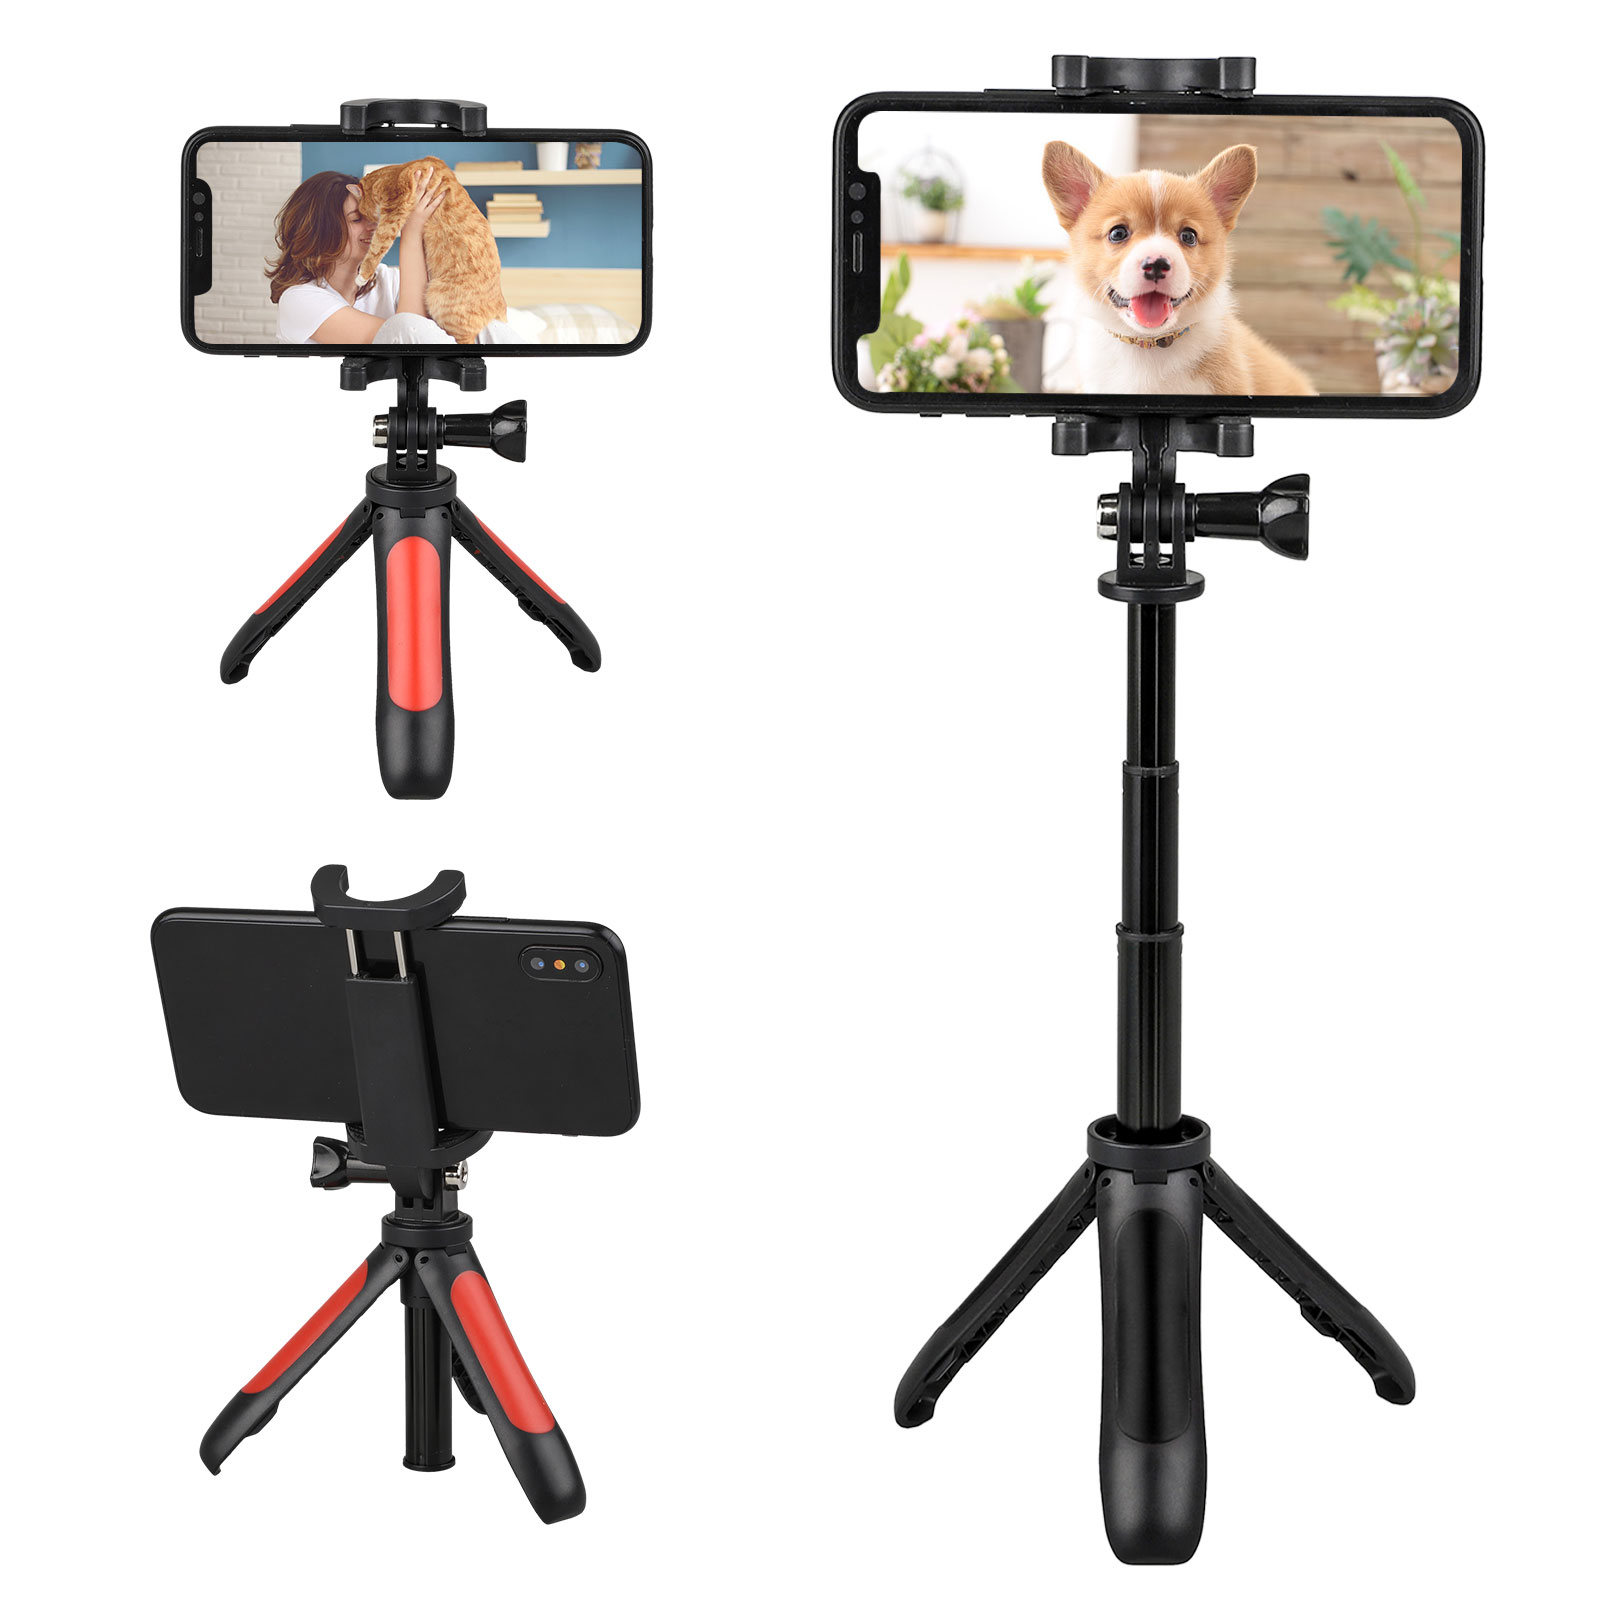 portable professional adjustable camera tripod stand mount